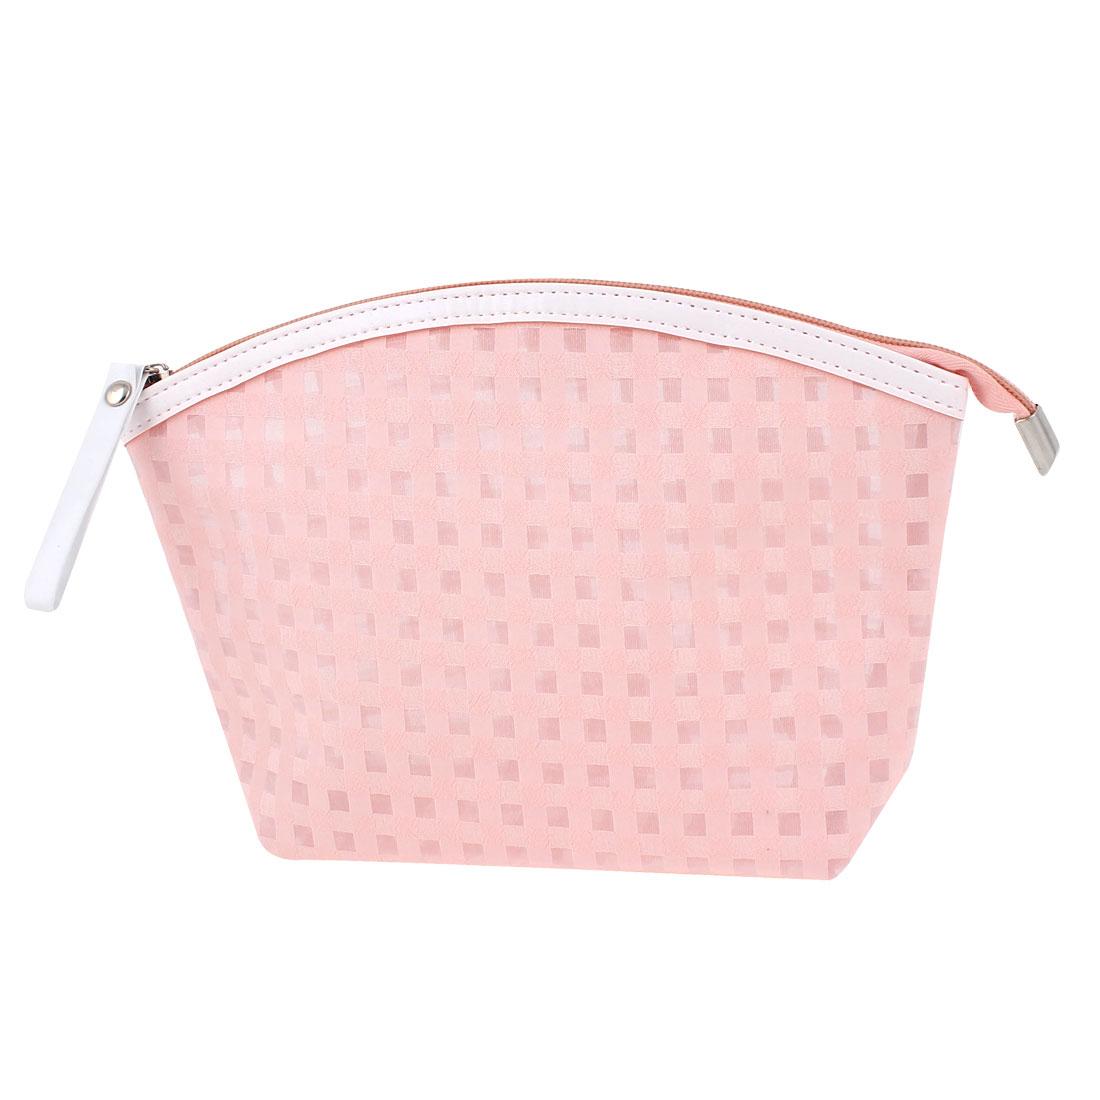 Travel Portable Zipper Closure Checks Pattern PVC Cosmetic Makeup Bag Key Change Handbag Toiletries Holder Pale Pink for Lady